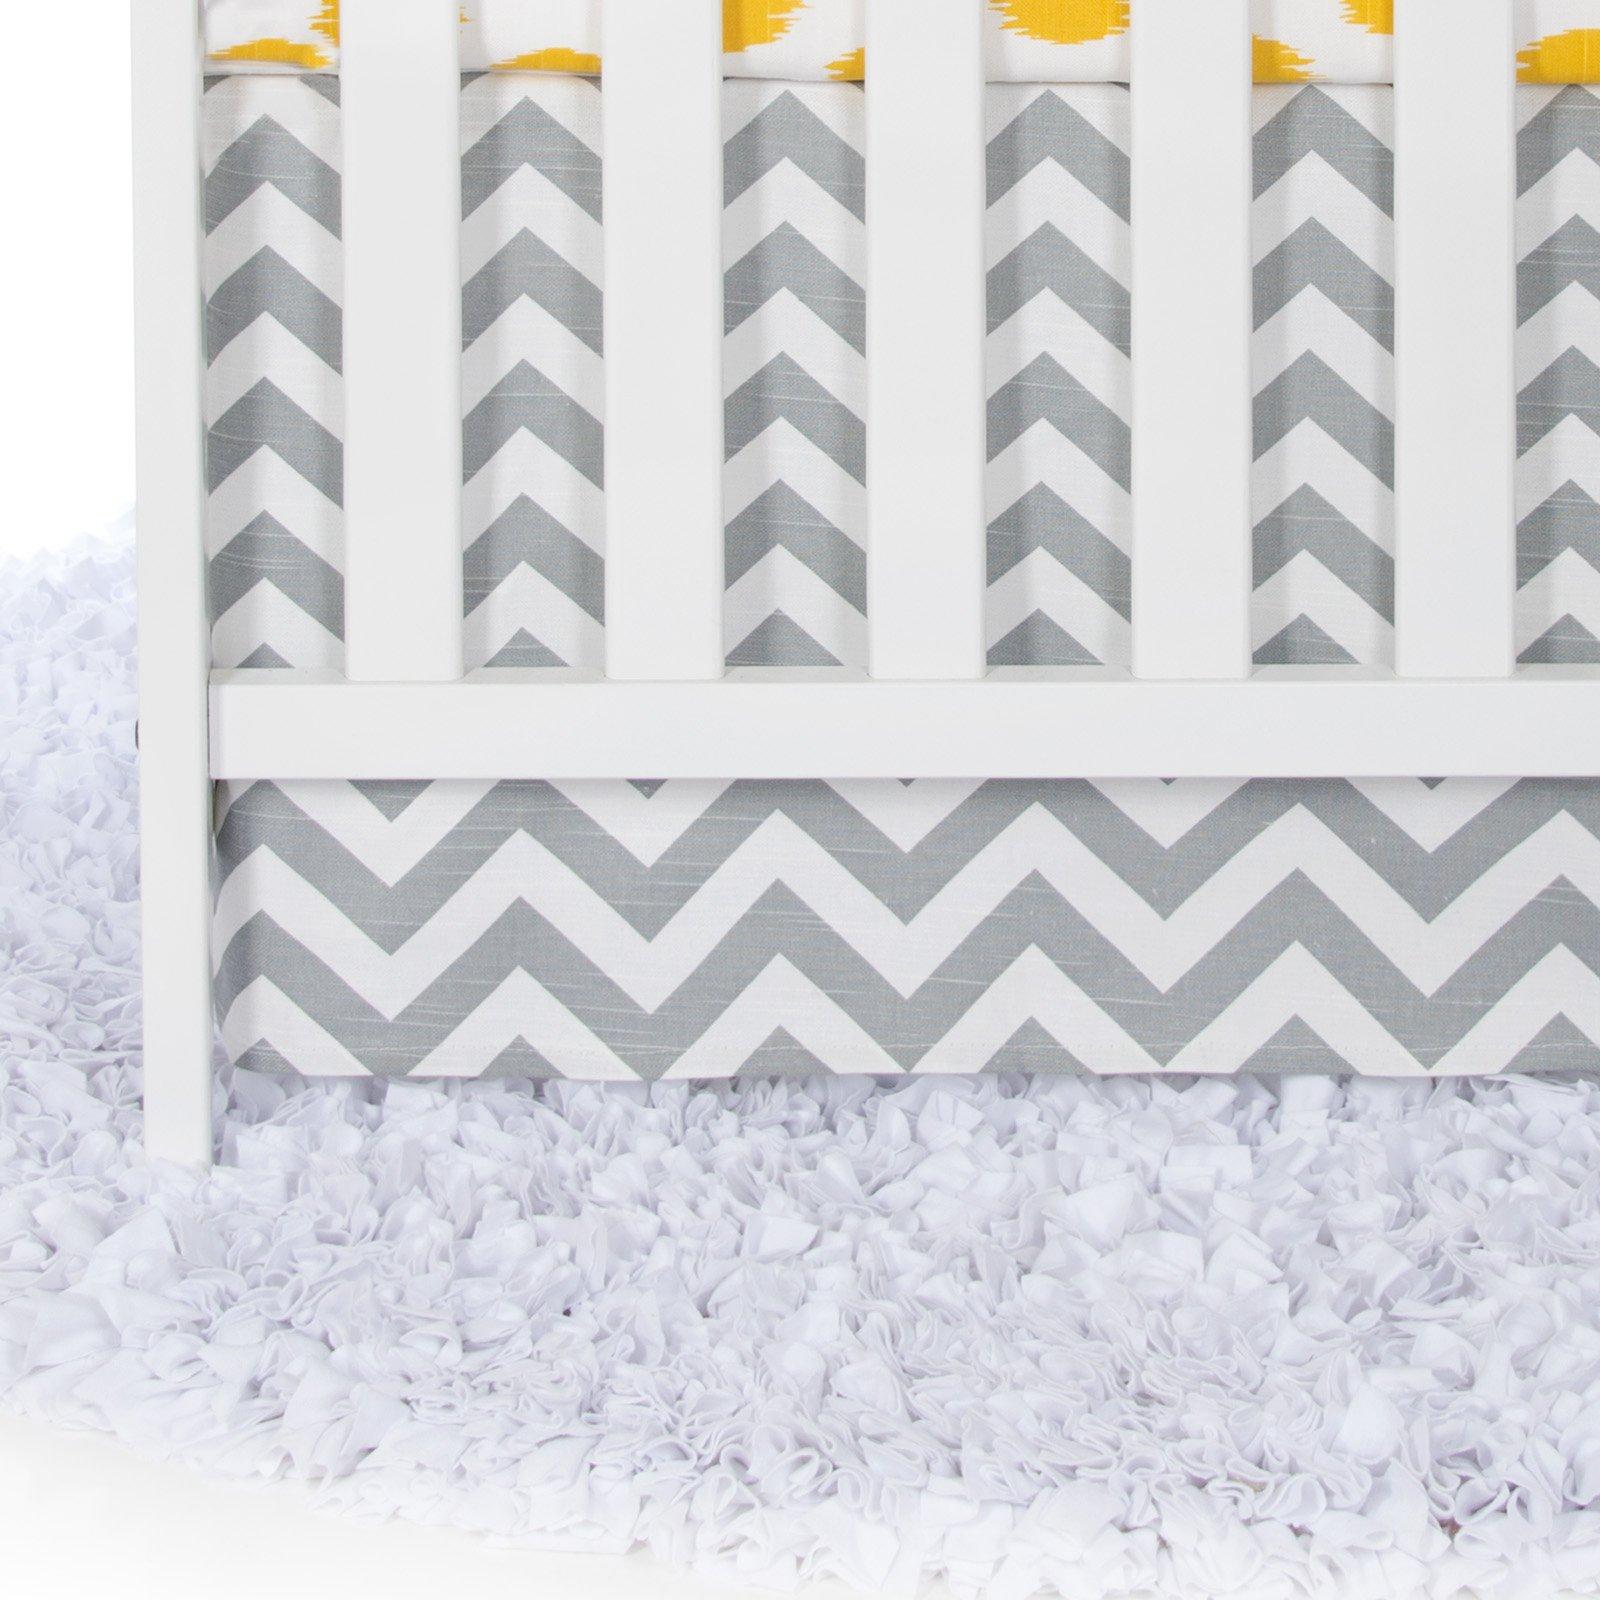 Glenna Jean Crib Swizzle Skirt Dust Ruffle for Baby Nursery Crib by Glenna Jean